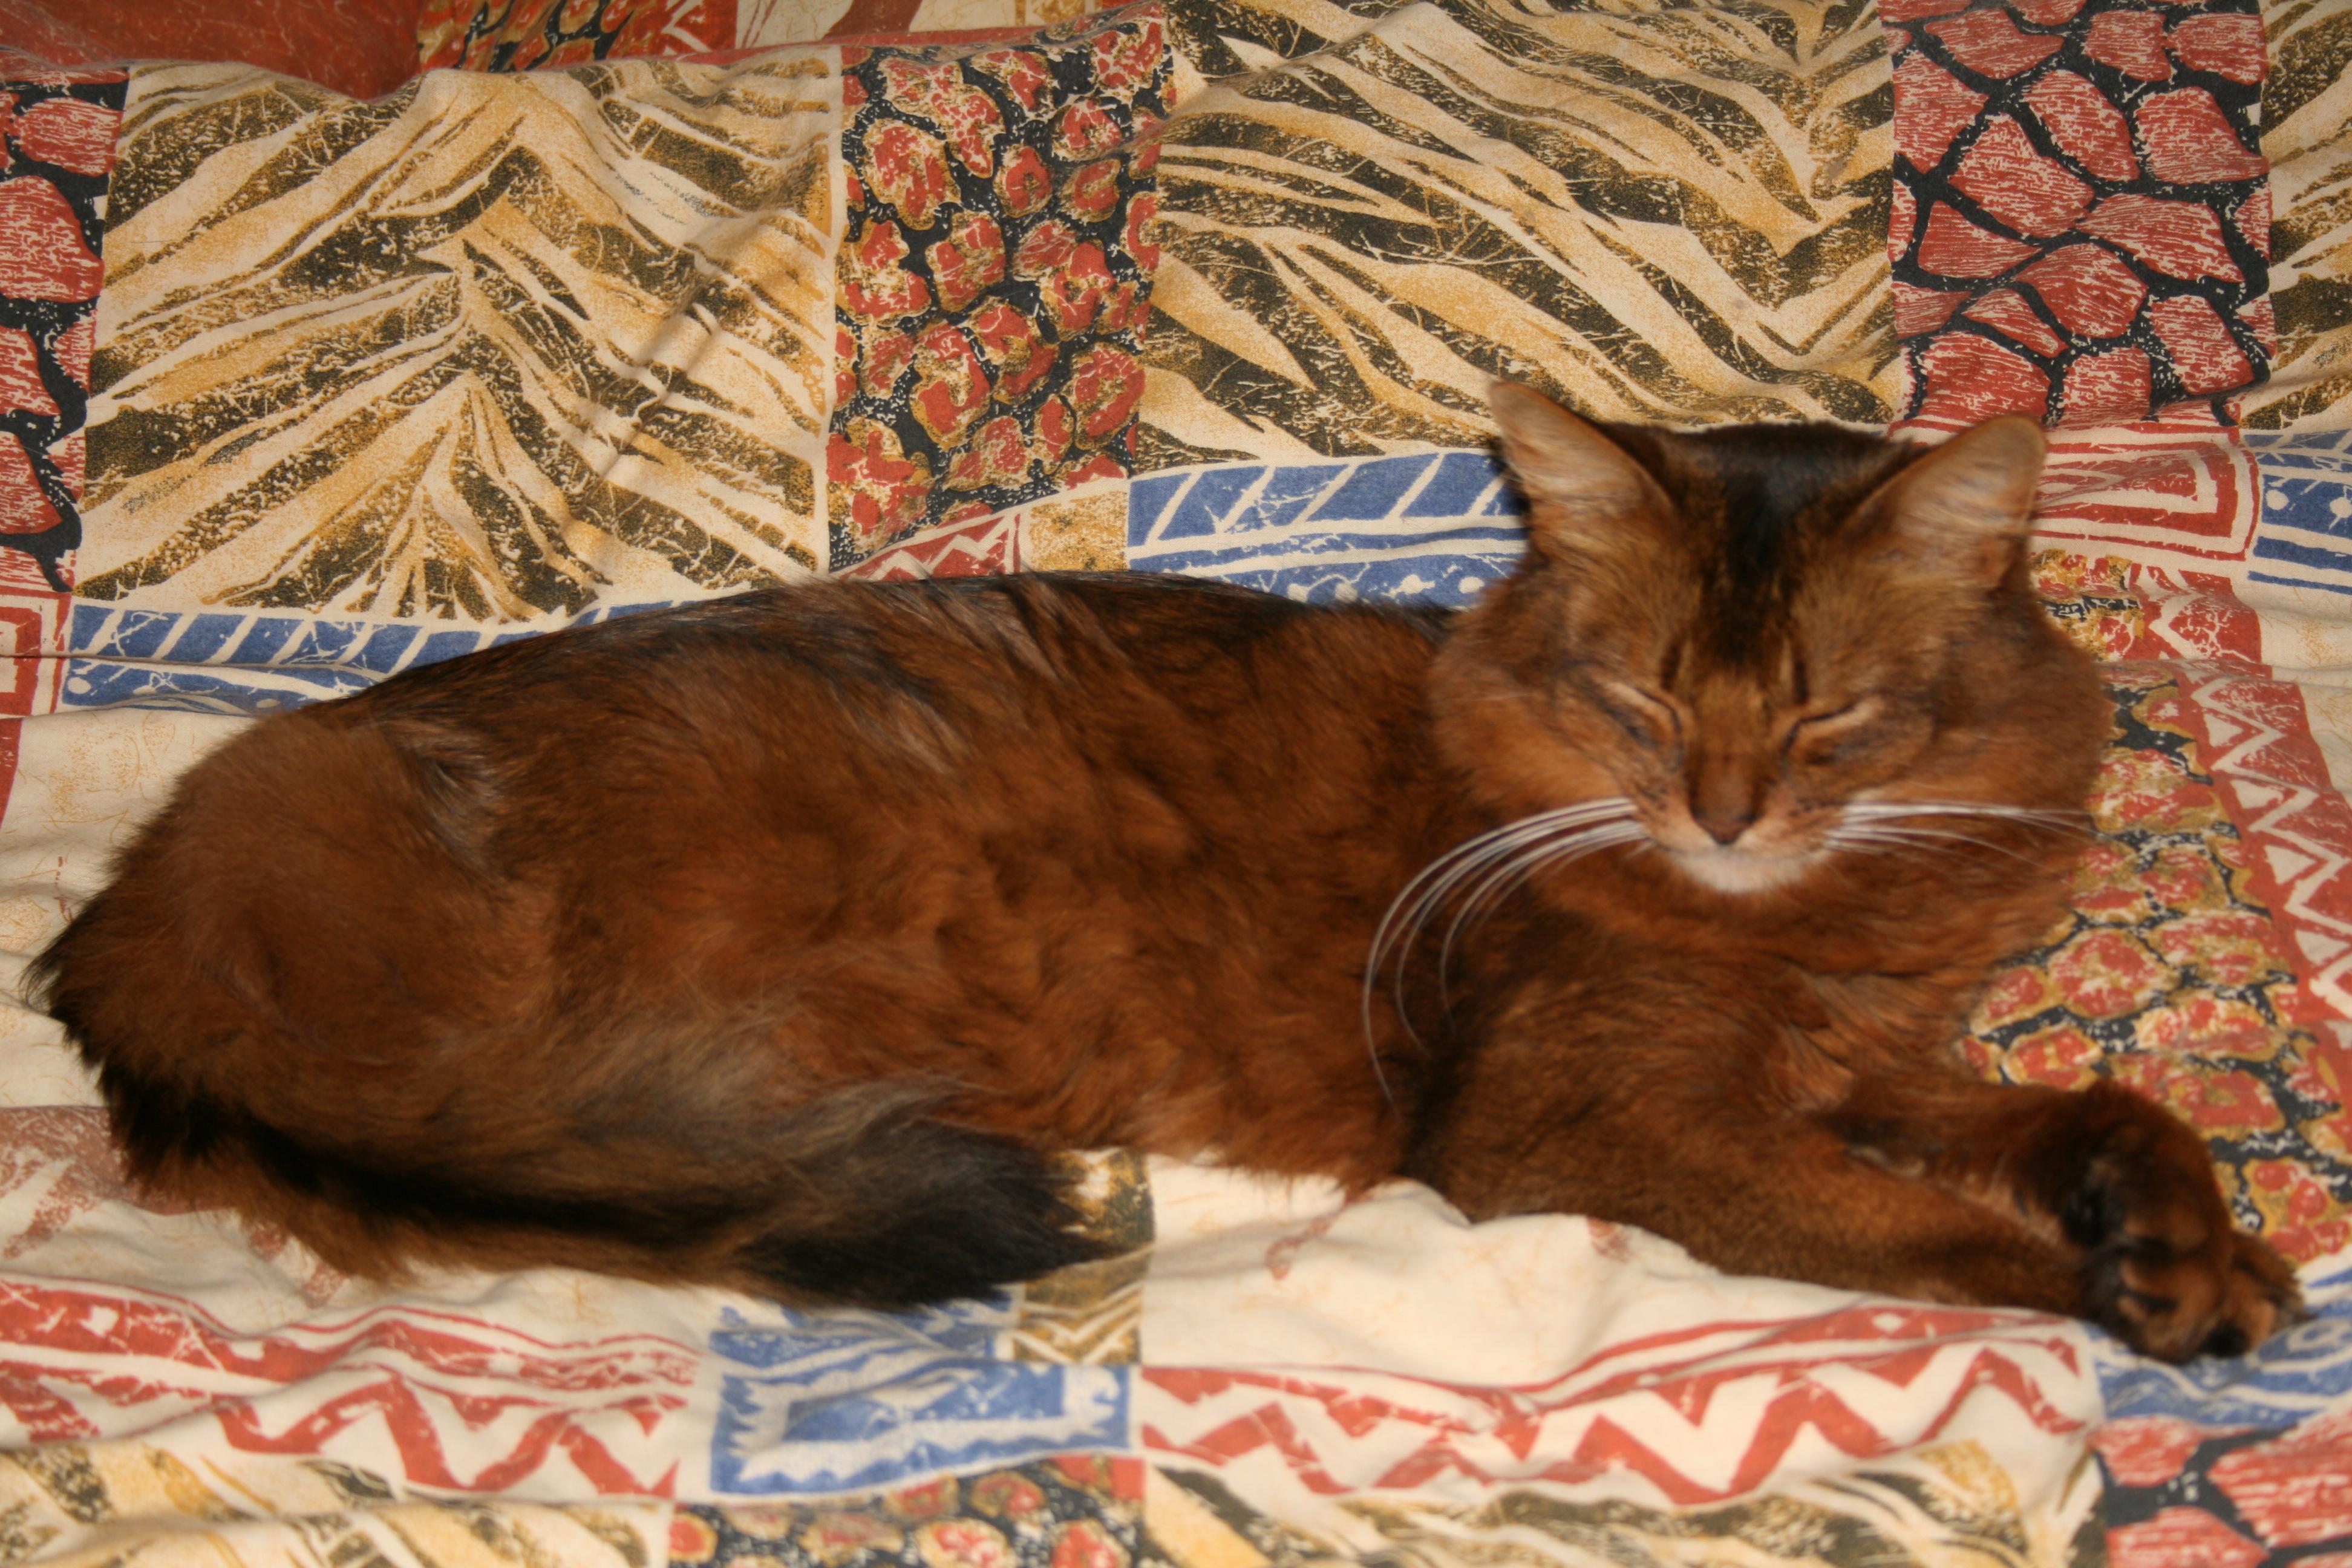 Adult Tawny Somali gallery image